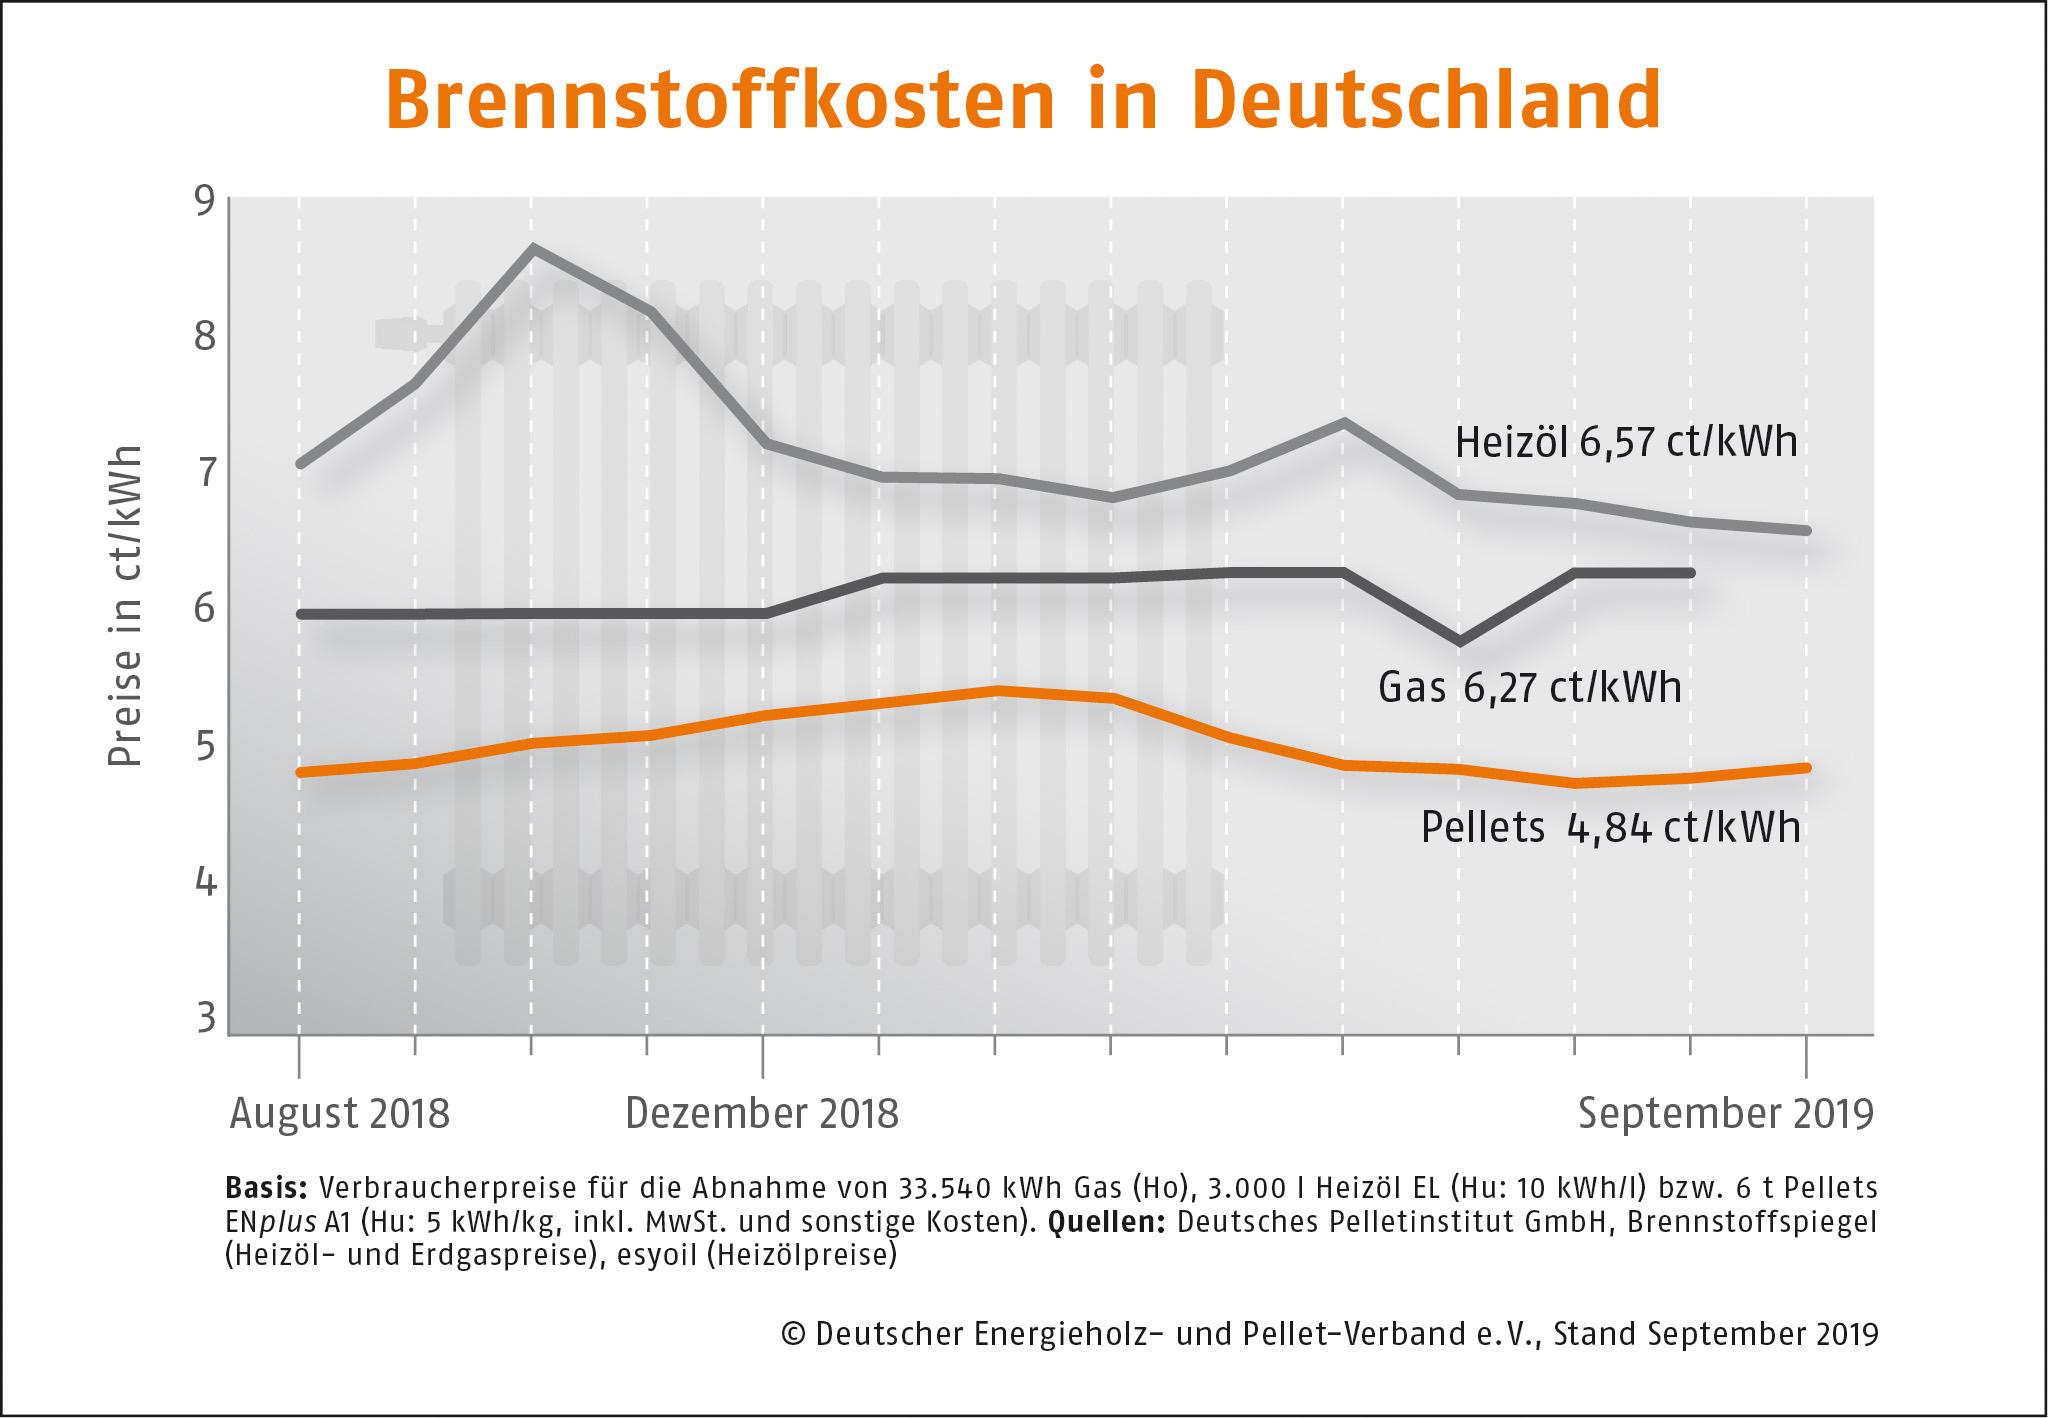 Brennstoffkosten-in-Deutschland--DEPI_Brennstoffkosten_September